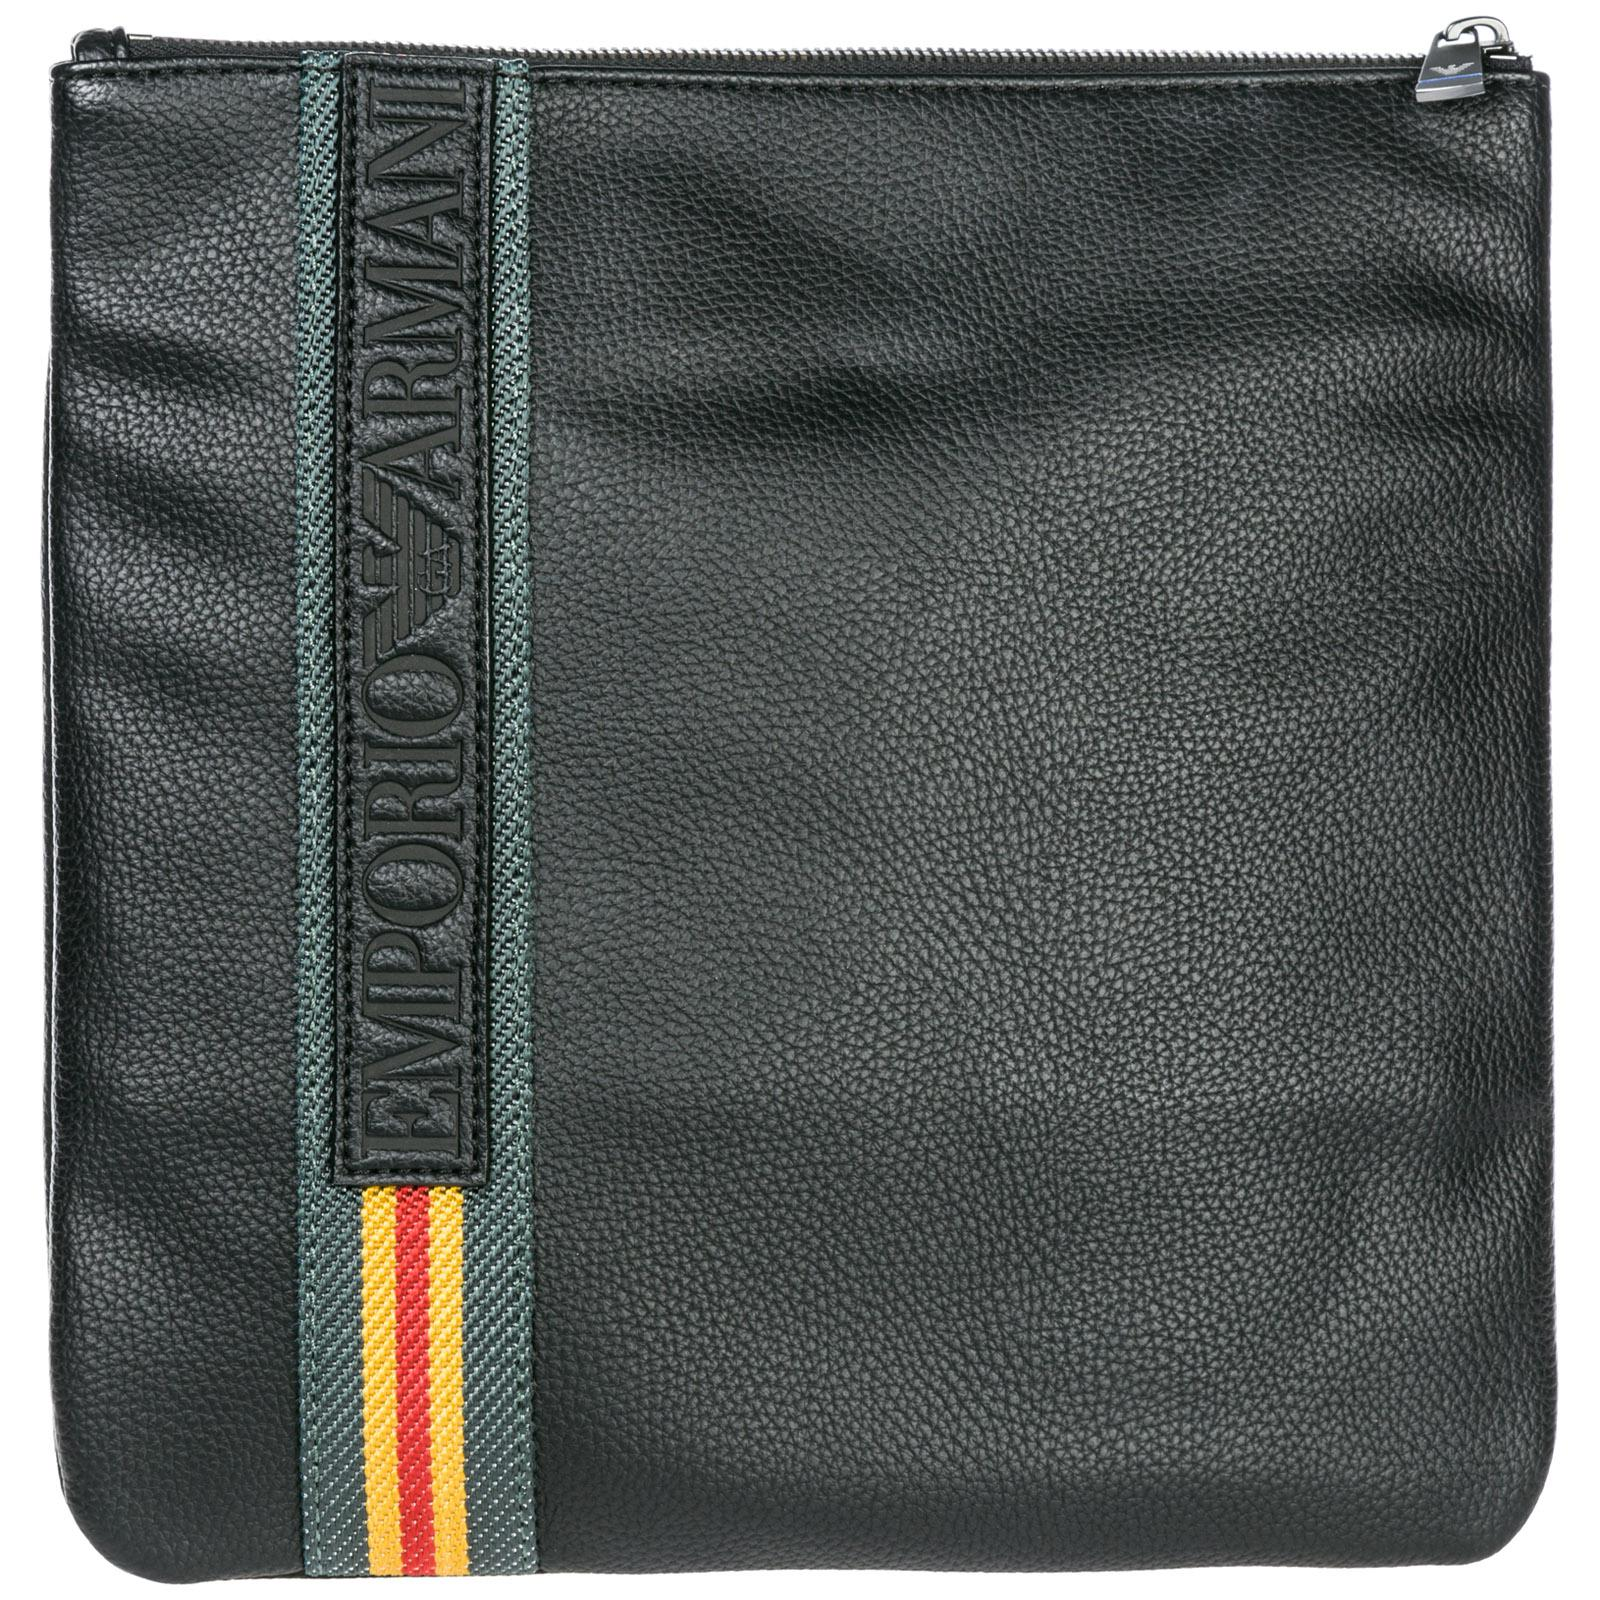 e897be66d304 Emporio Armani Cross-body Messenger Shoulder Bag in Black for Men - Lyst